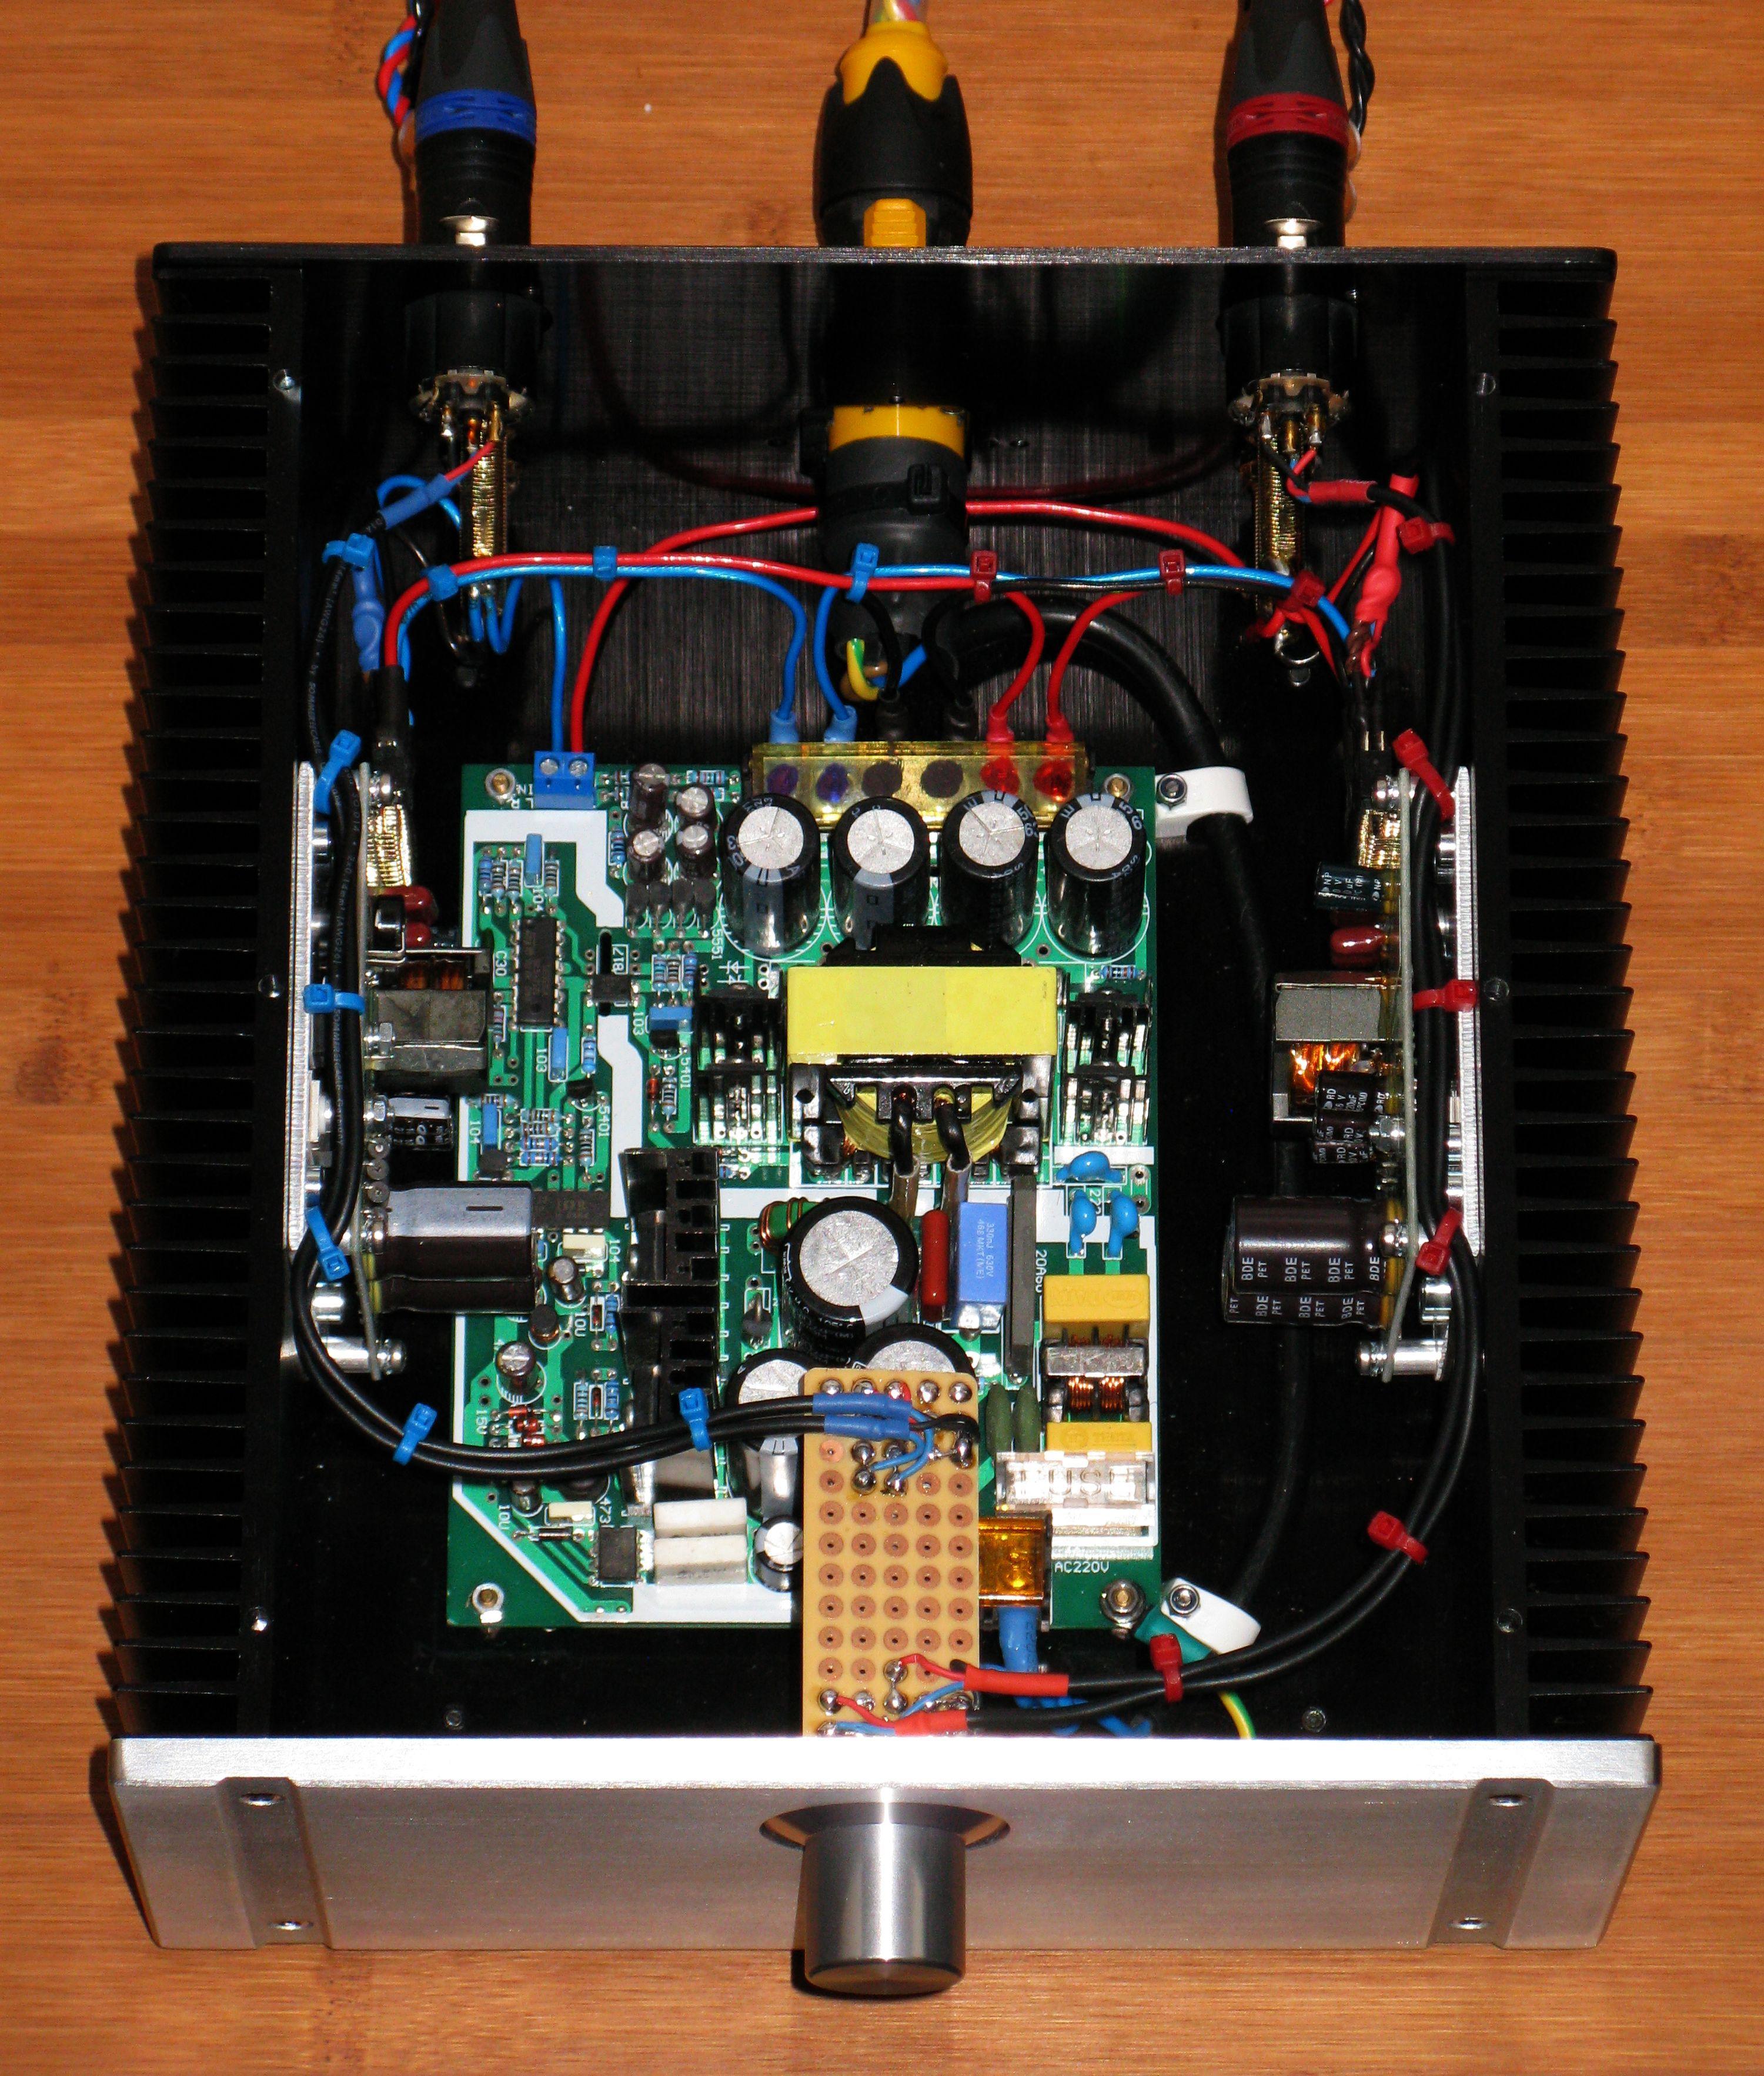 Hypex UcD400-OEM [Archiv] - DIY-HIFI-Forum